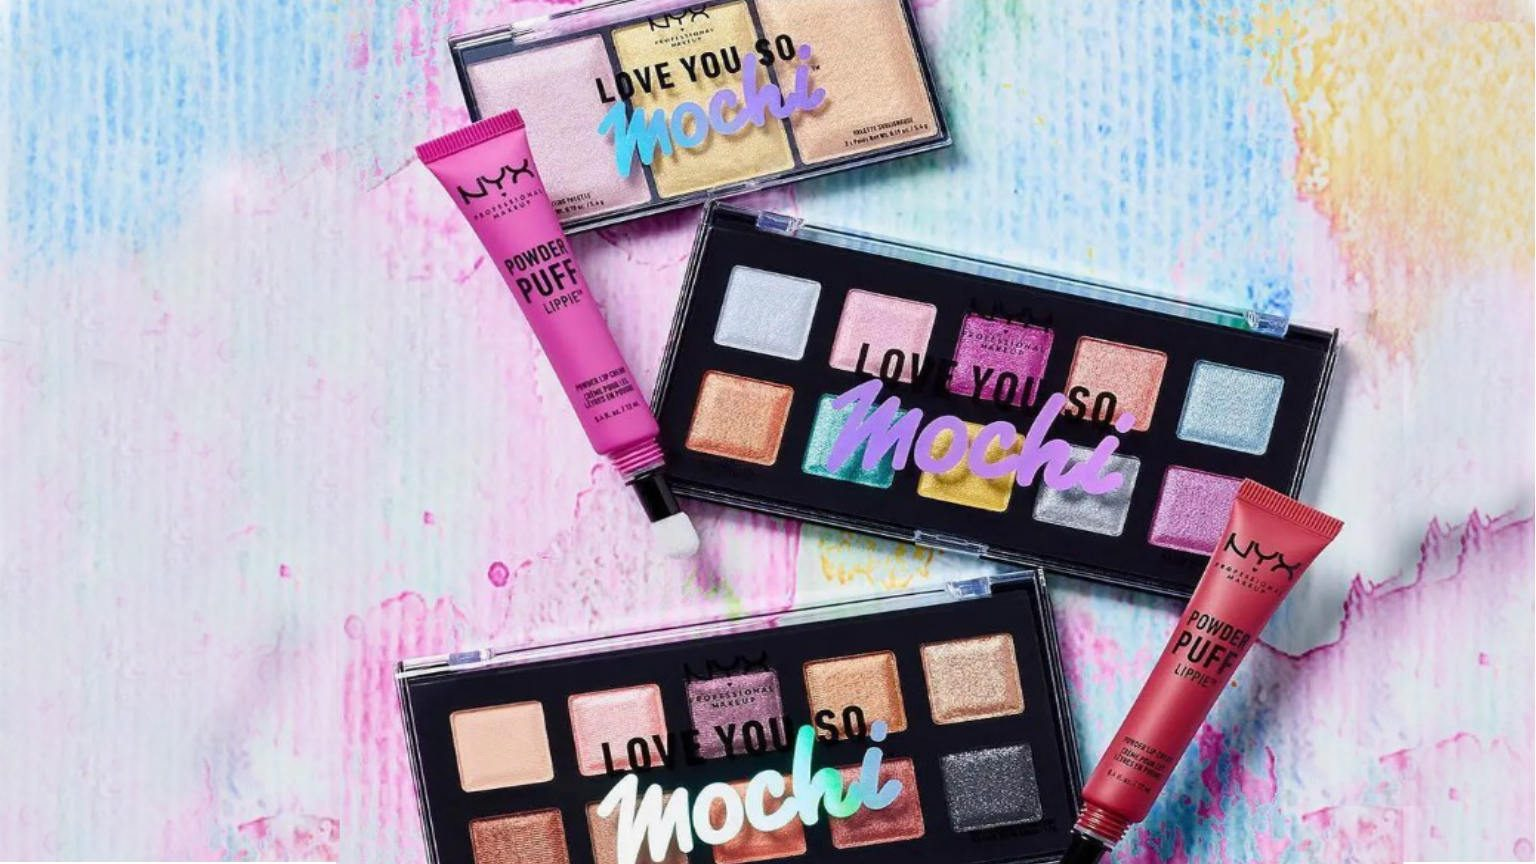 Nyx mochi cosmetics